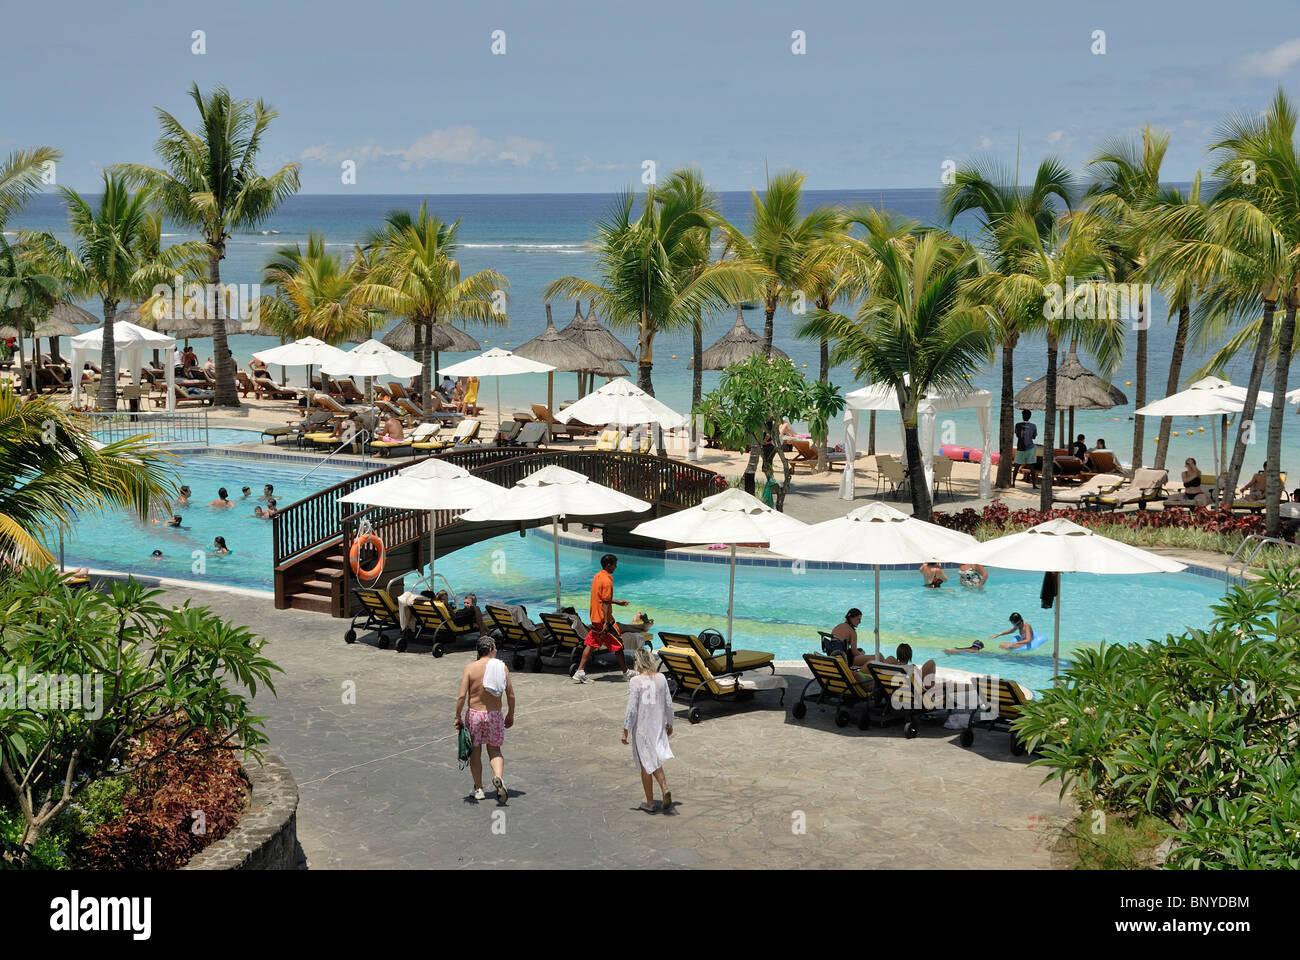 Le meridien ile maurice island of mauritius swimming pool for Swimming pool mauritius